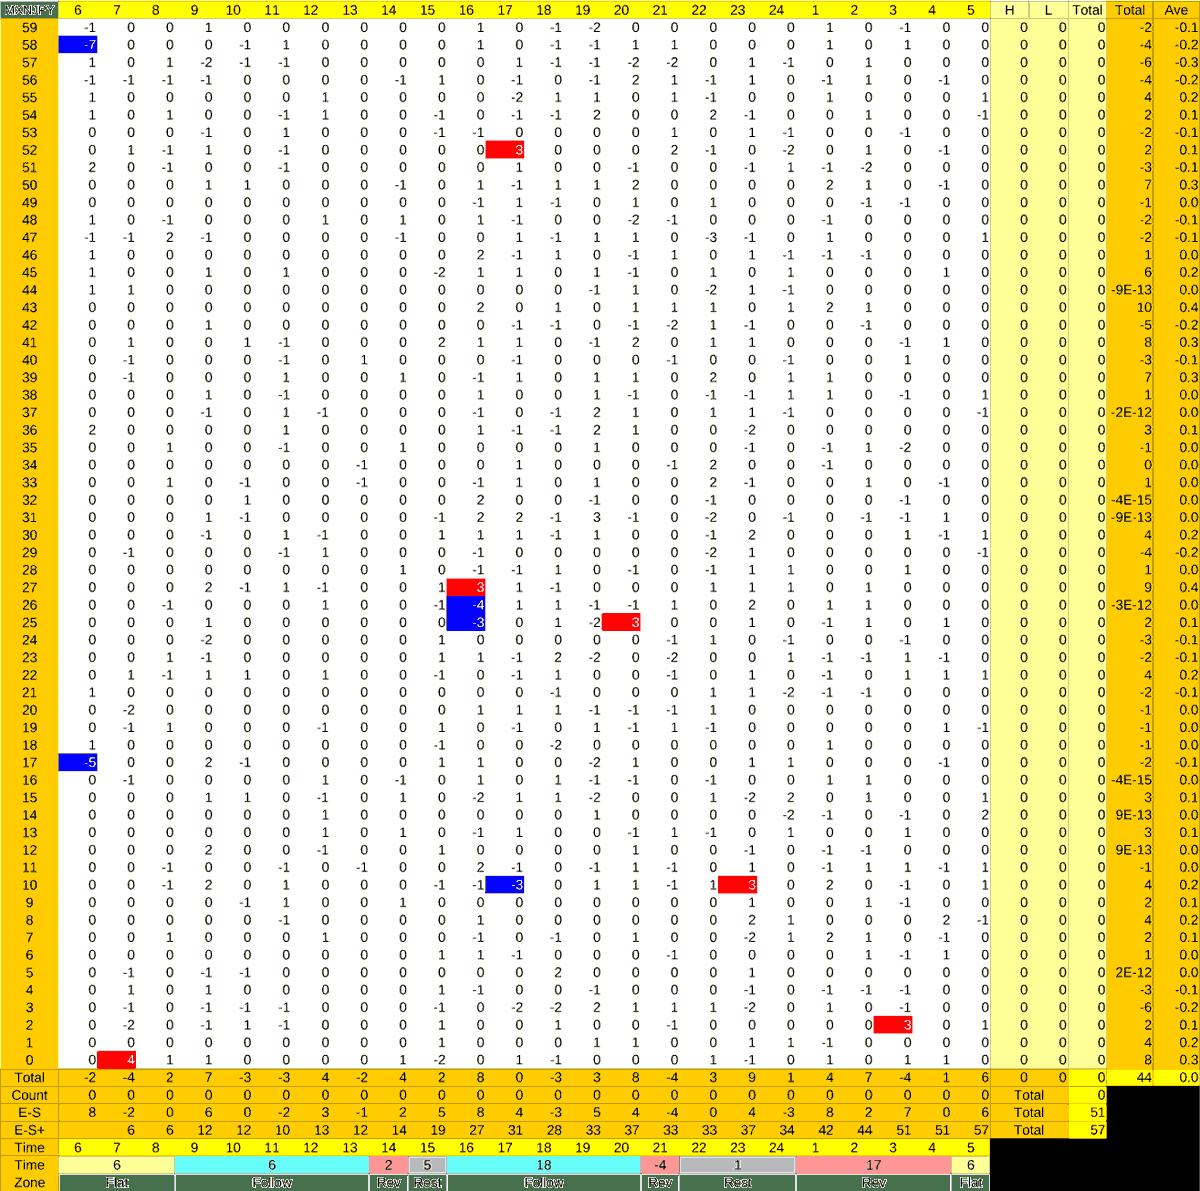 20210608_HS(3)MXNJPY